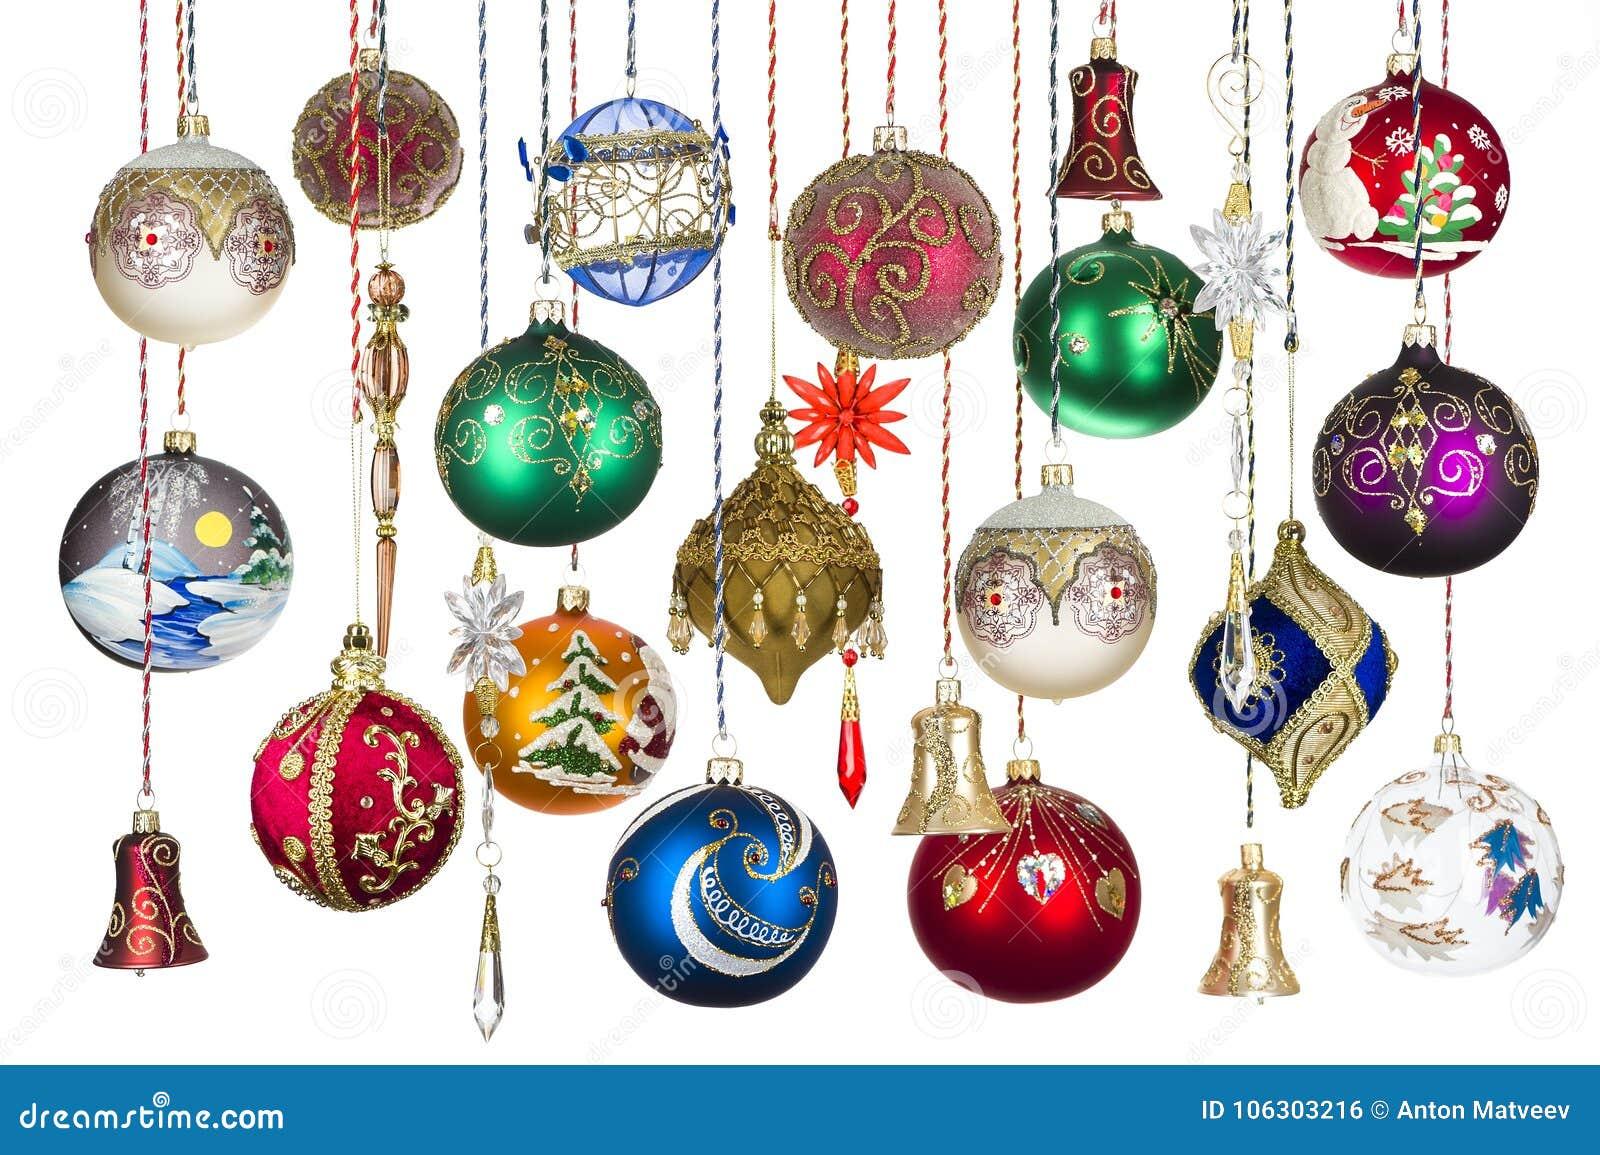 Christmas tree toys stock photo. Image of event, orange - 106303216